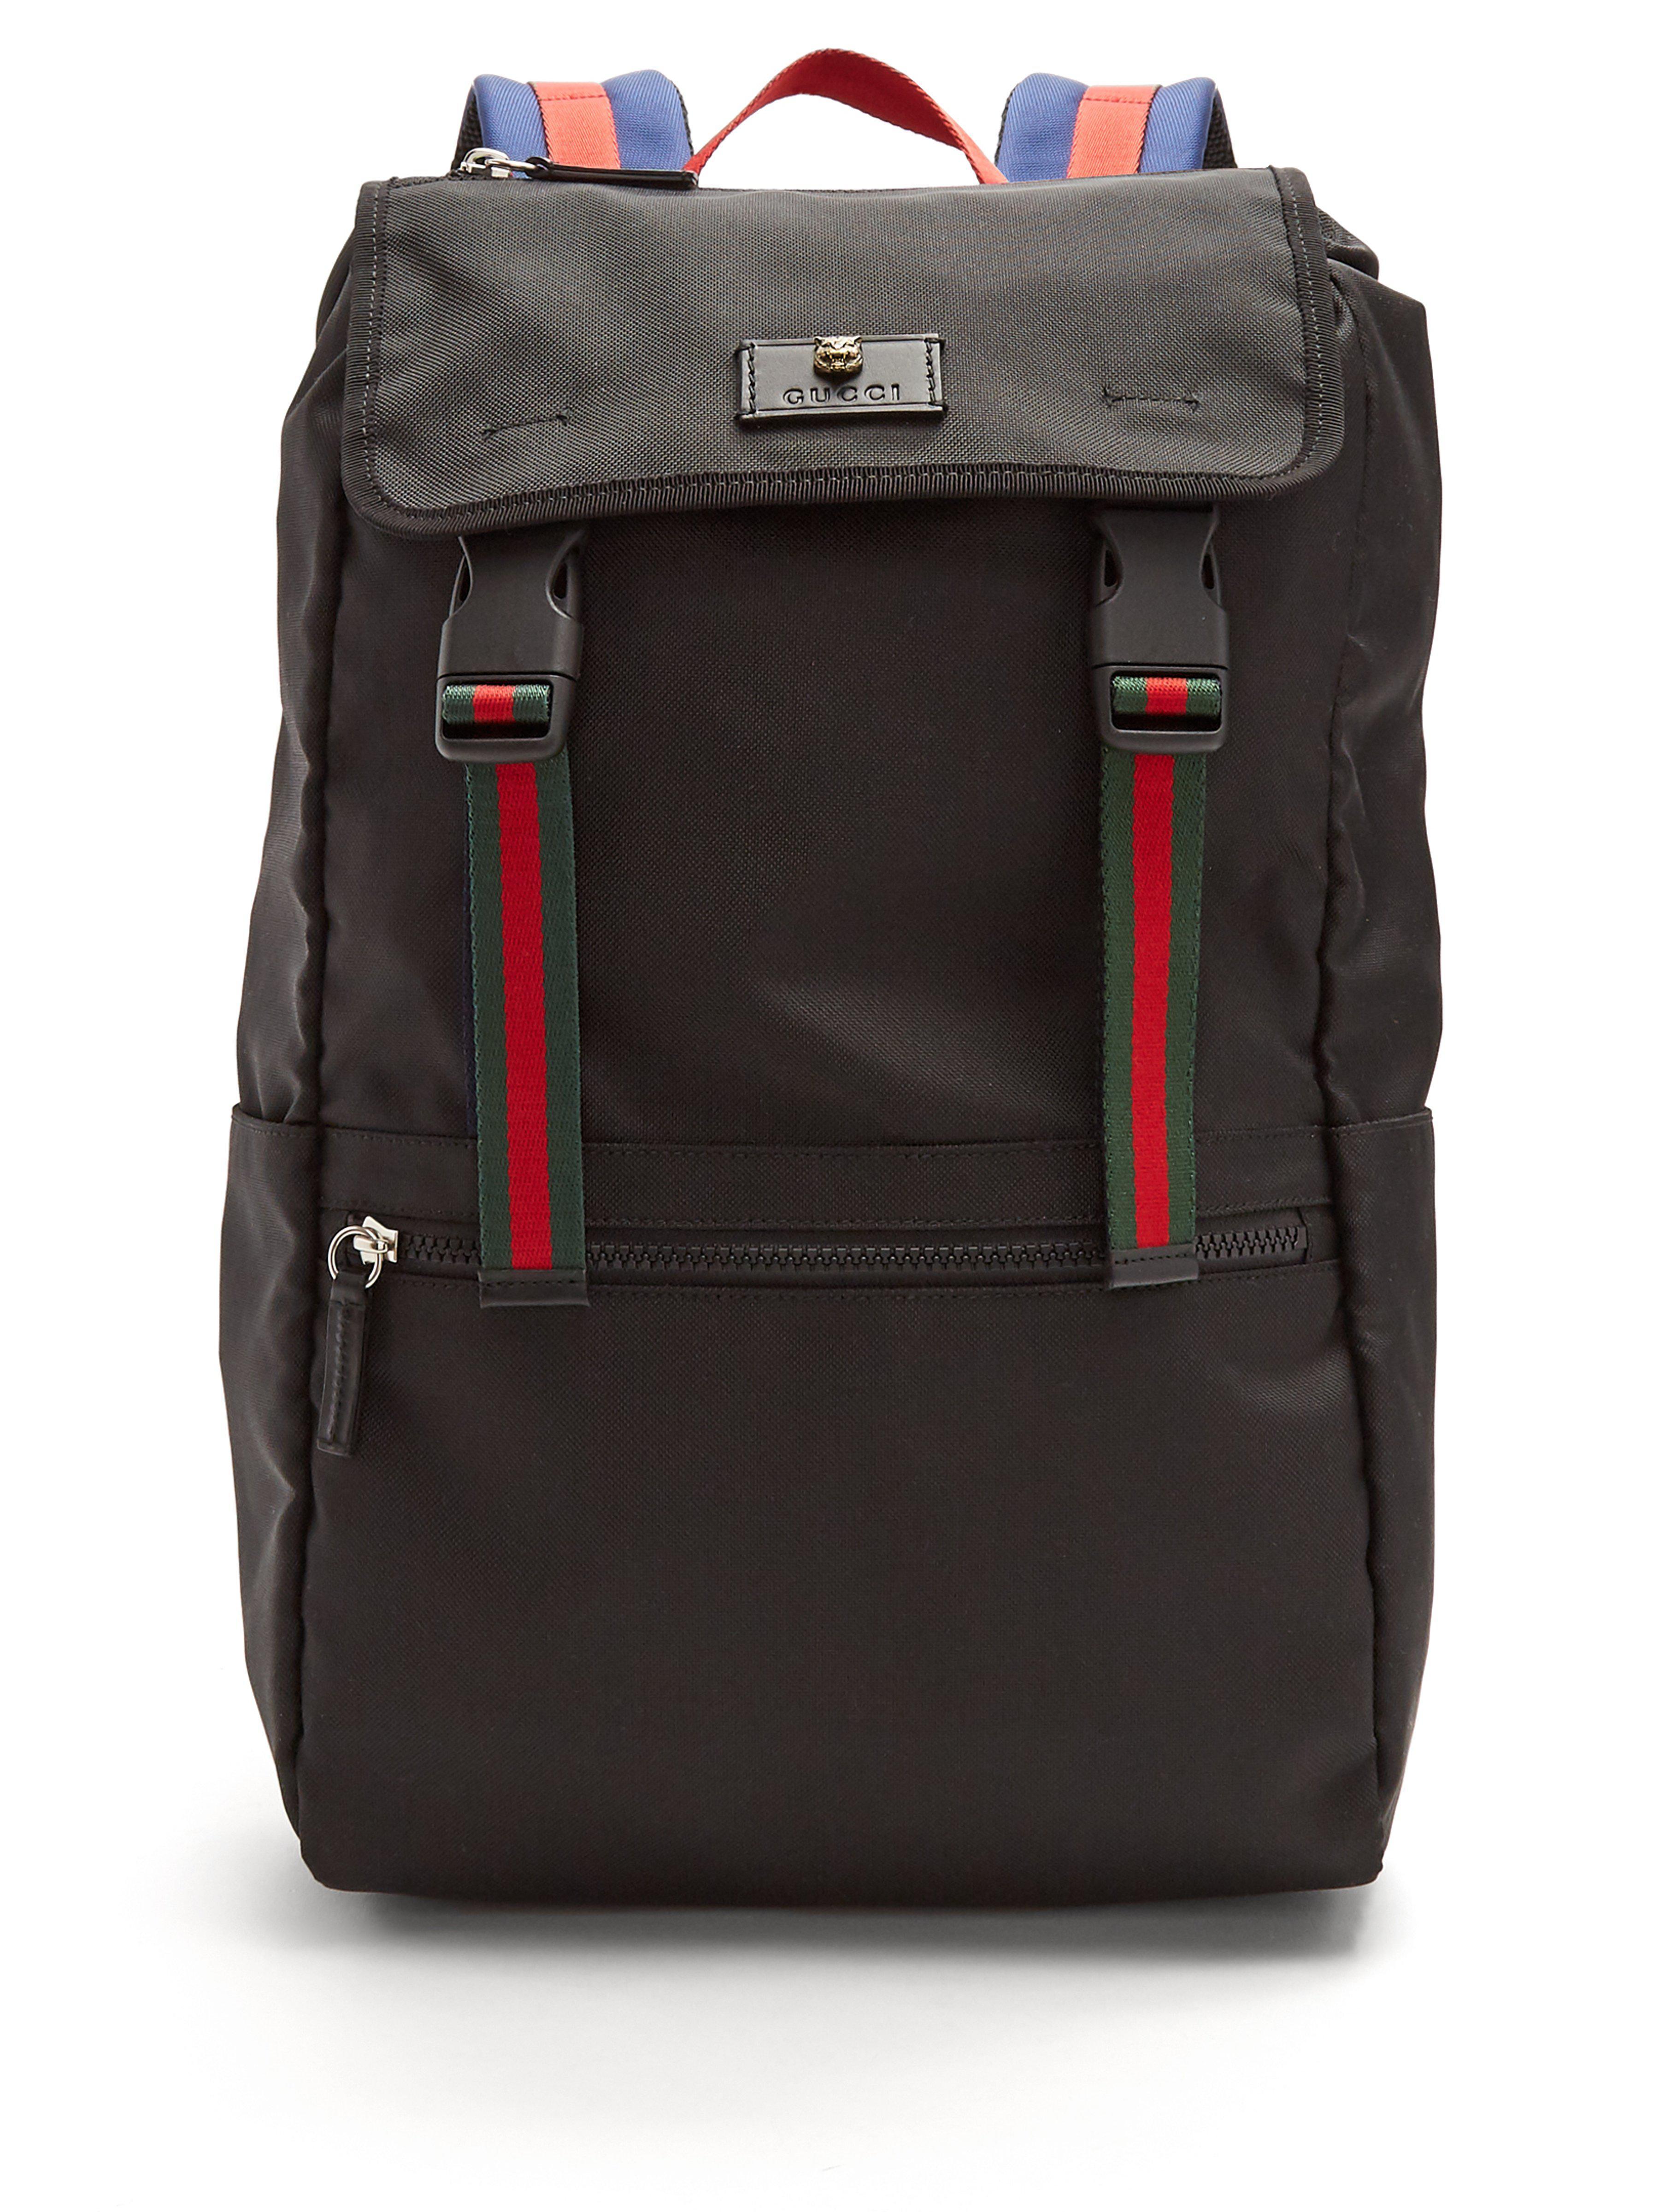 473e33719b99 Gucci Web-stripe Backpack in Black for Men - Lyst